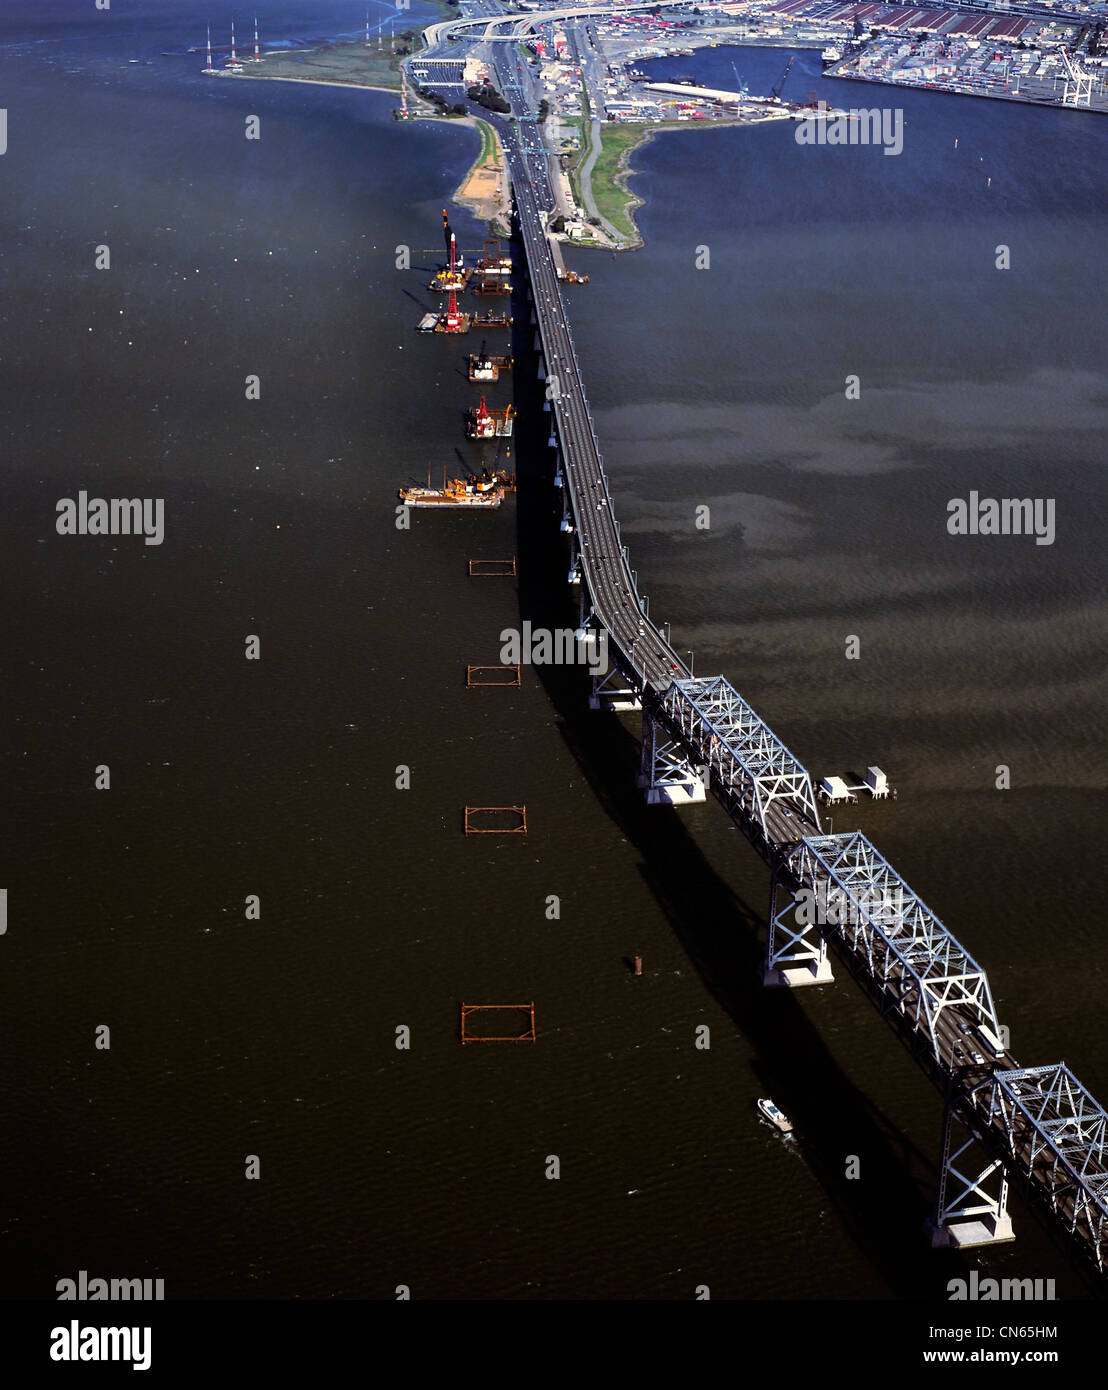 aerial photograph of San Francisco Oakland Bay Bridge construction - Stock Image